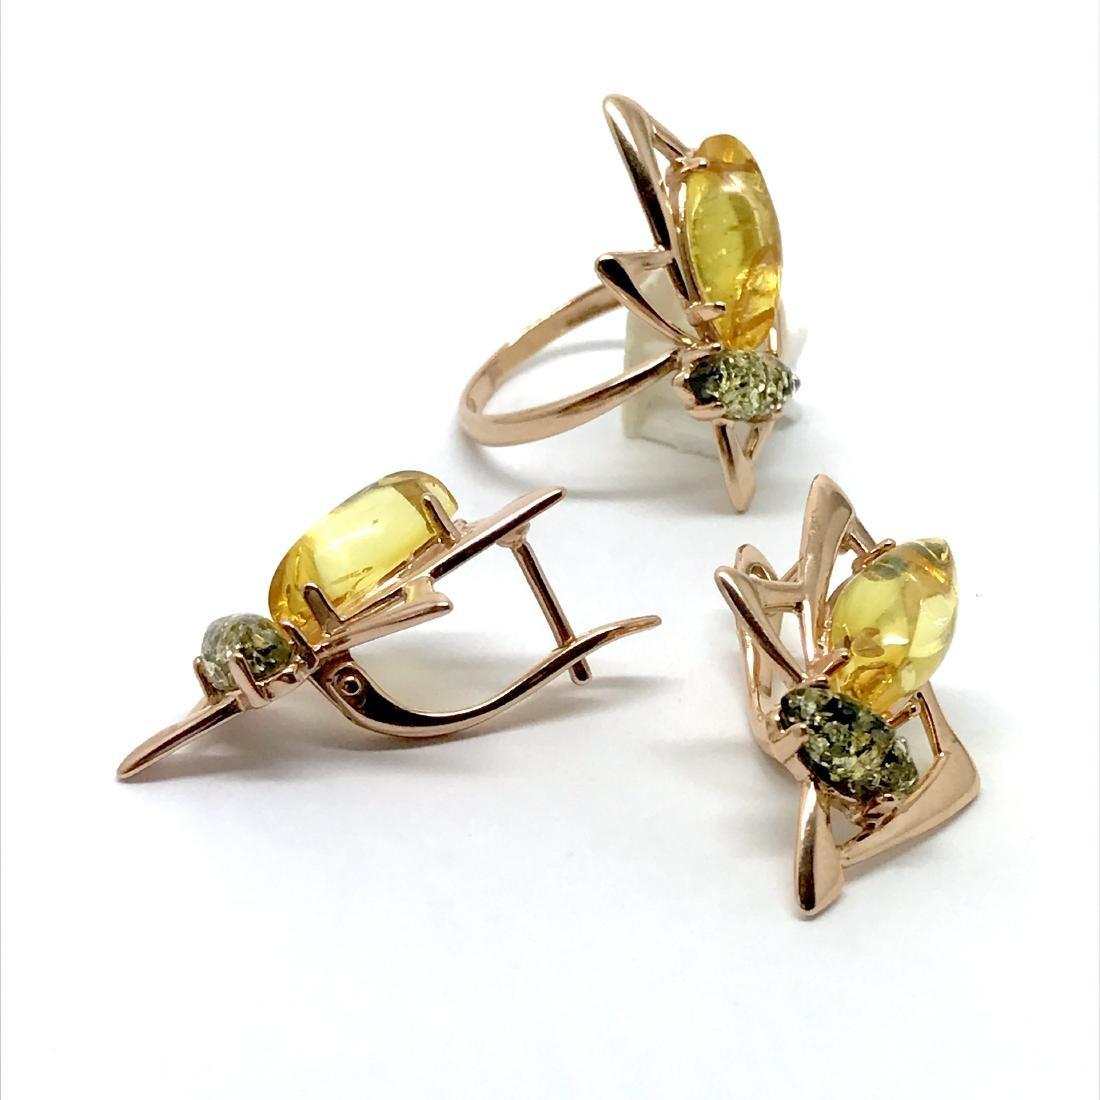 Baltic amber set Ring + Earrings Ag925 goldplated - 6